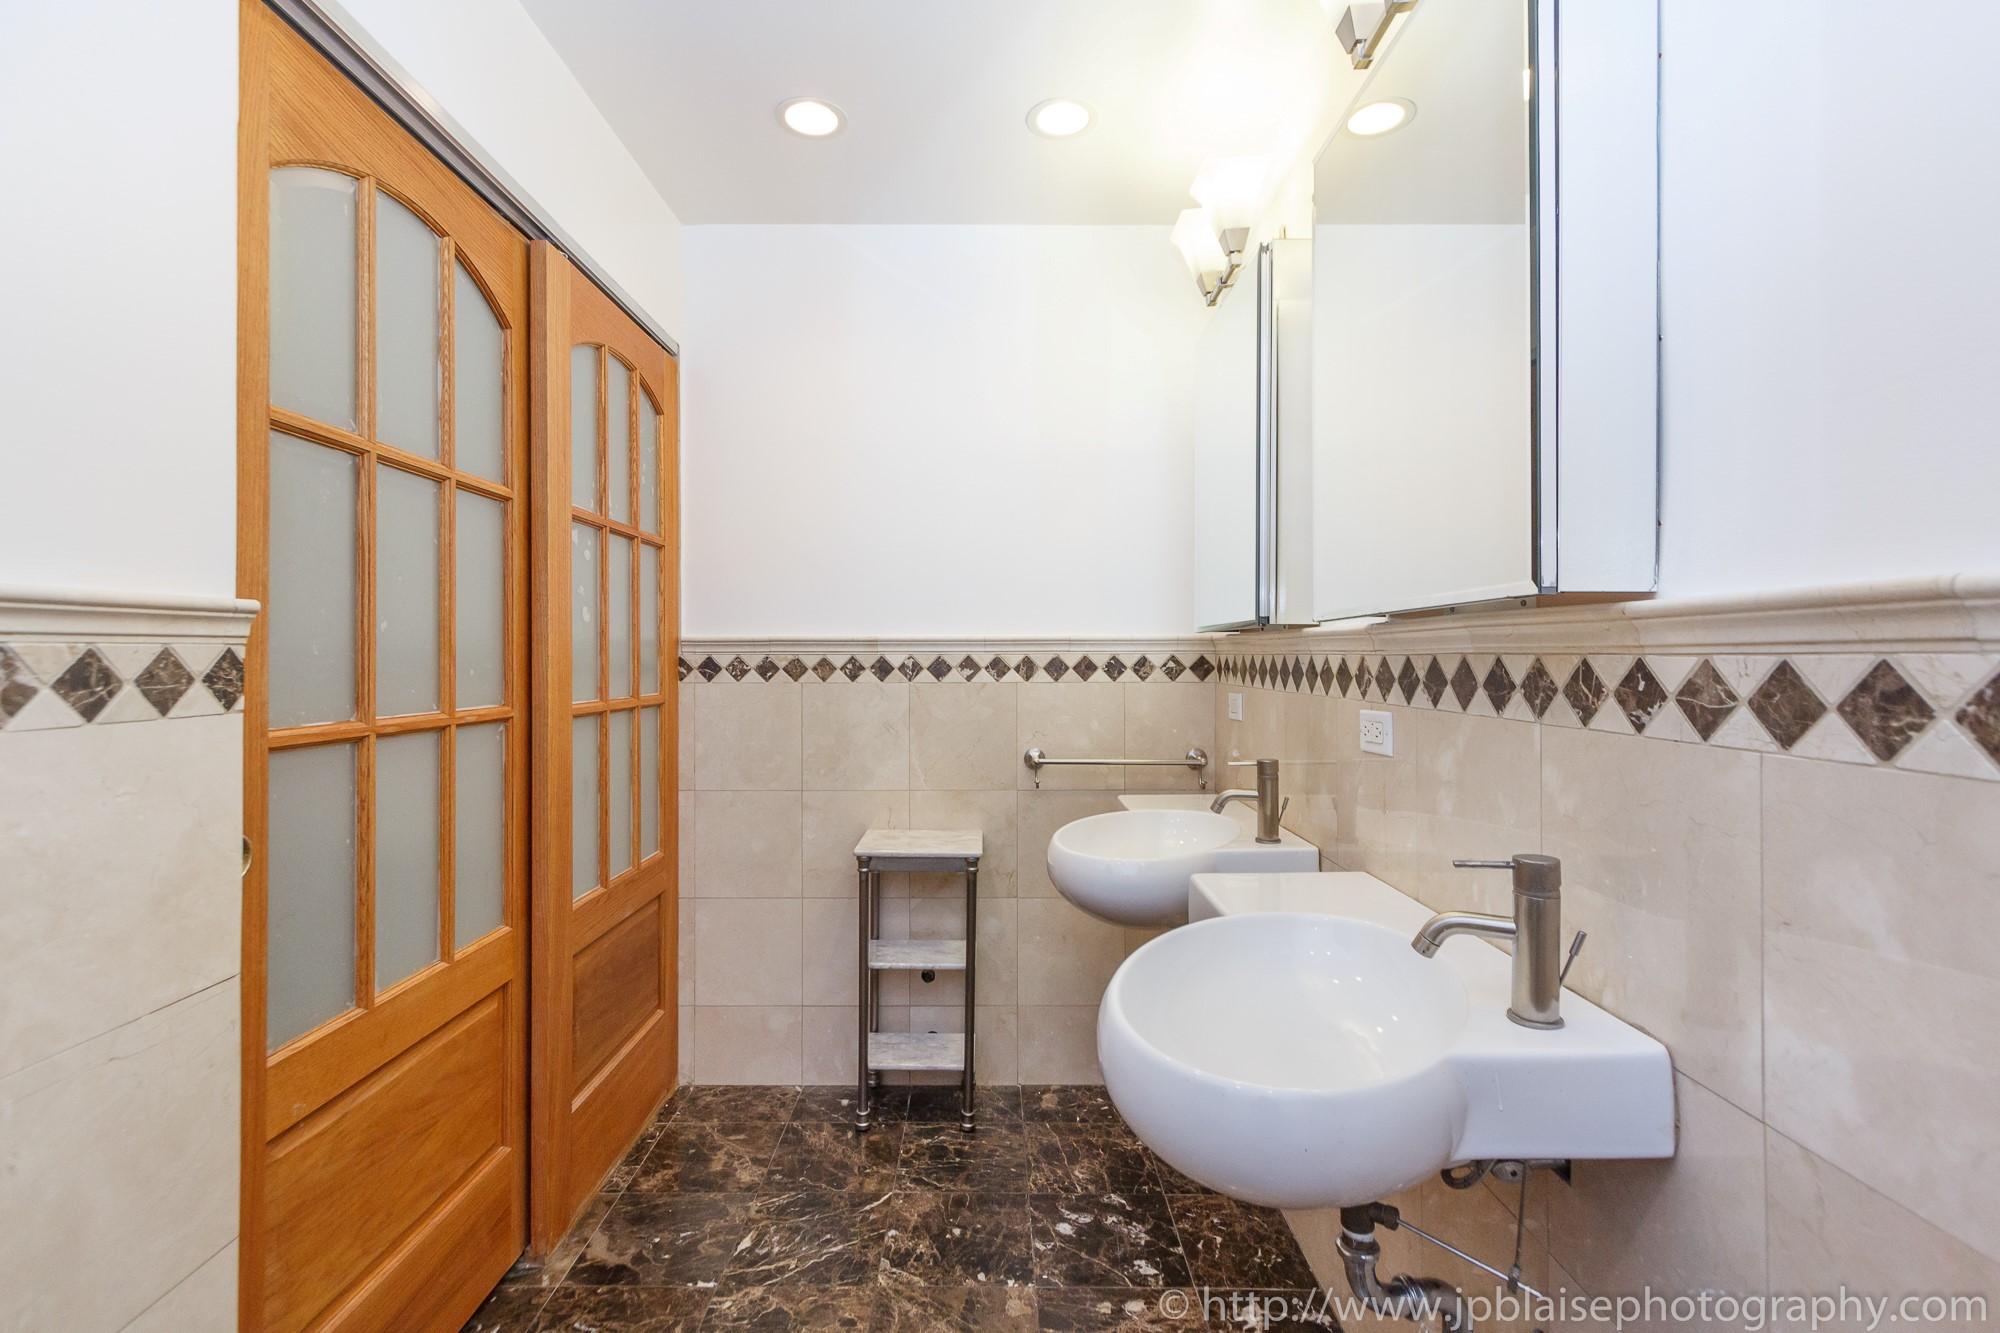 New York City apartment photographer Midtown East One Bedroom unit bathroom